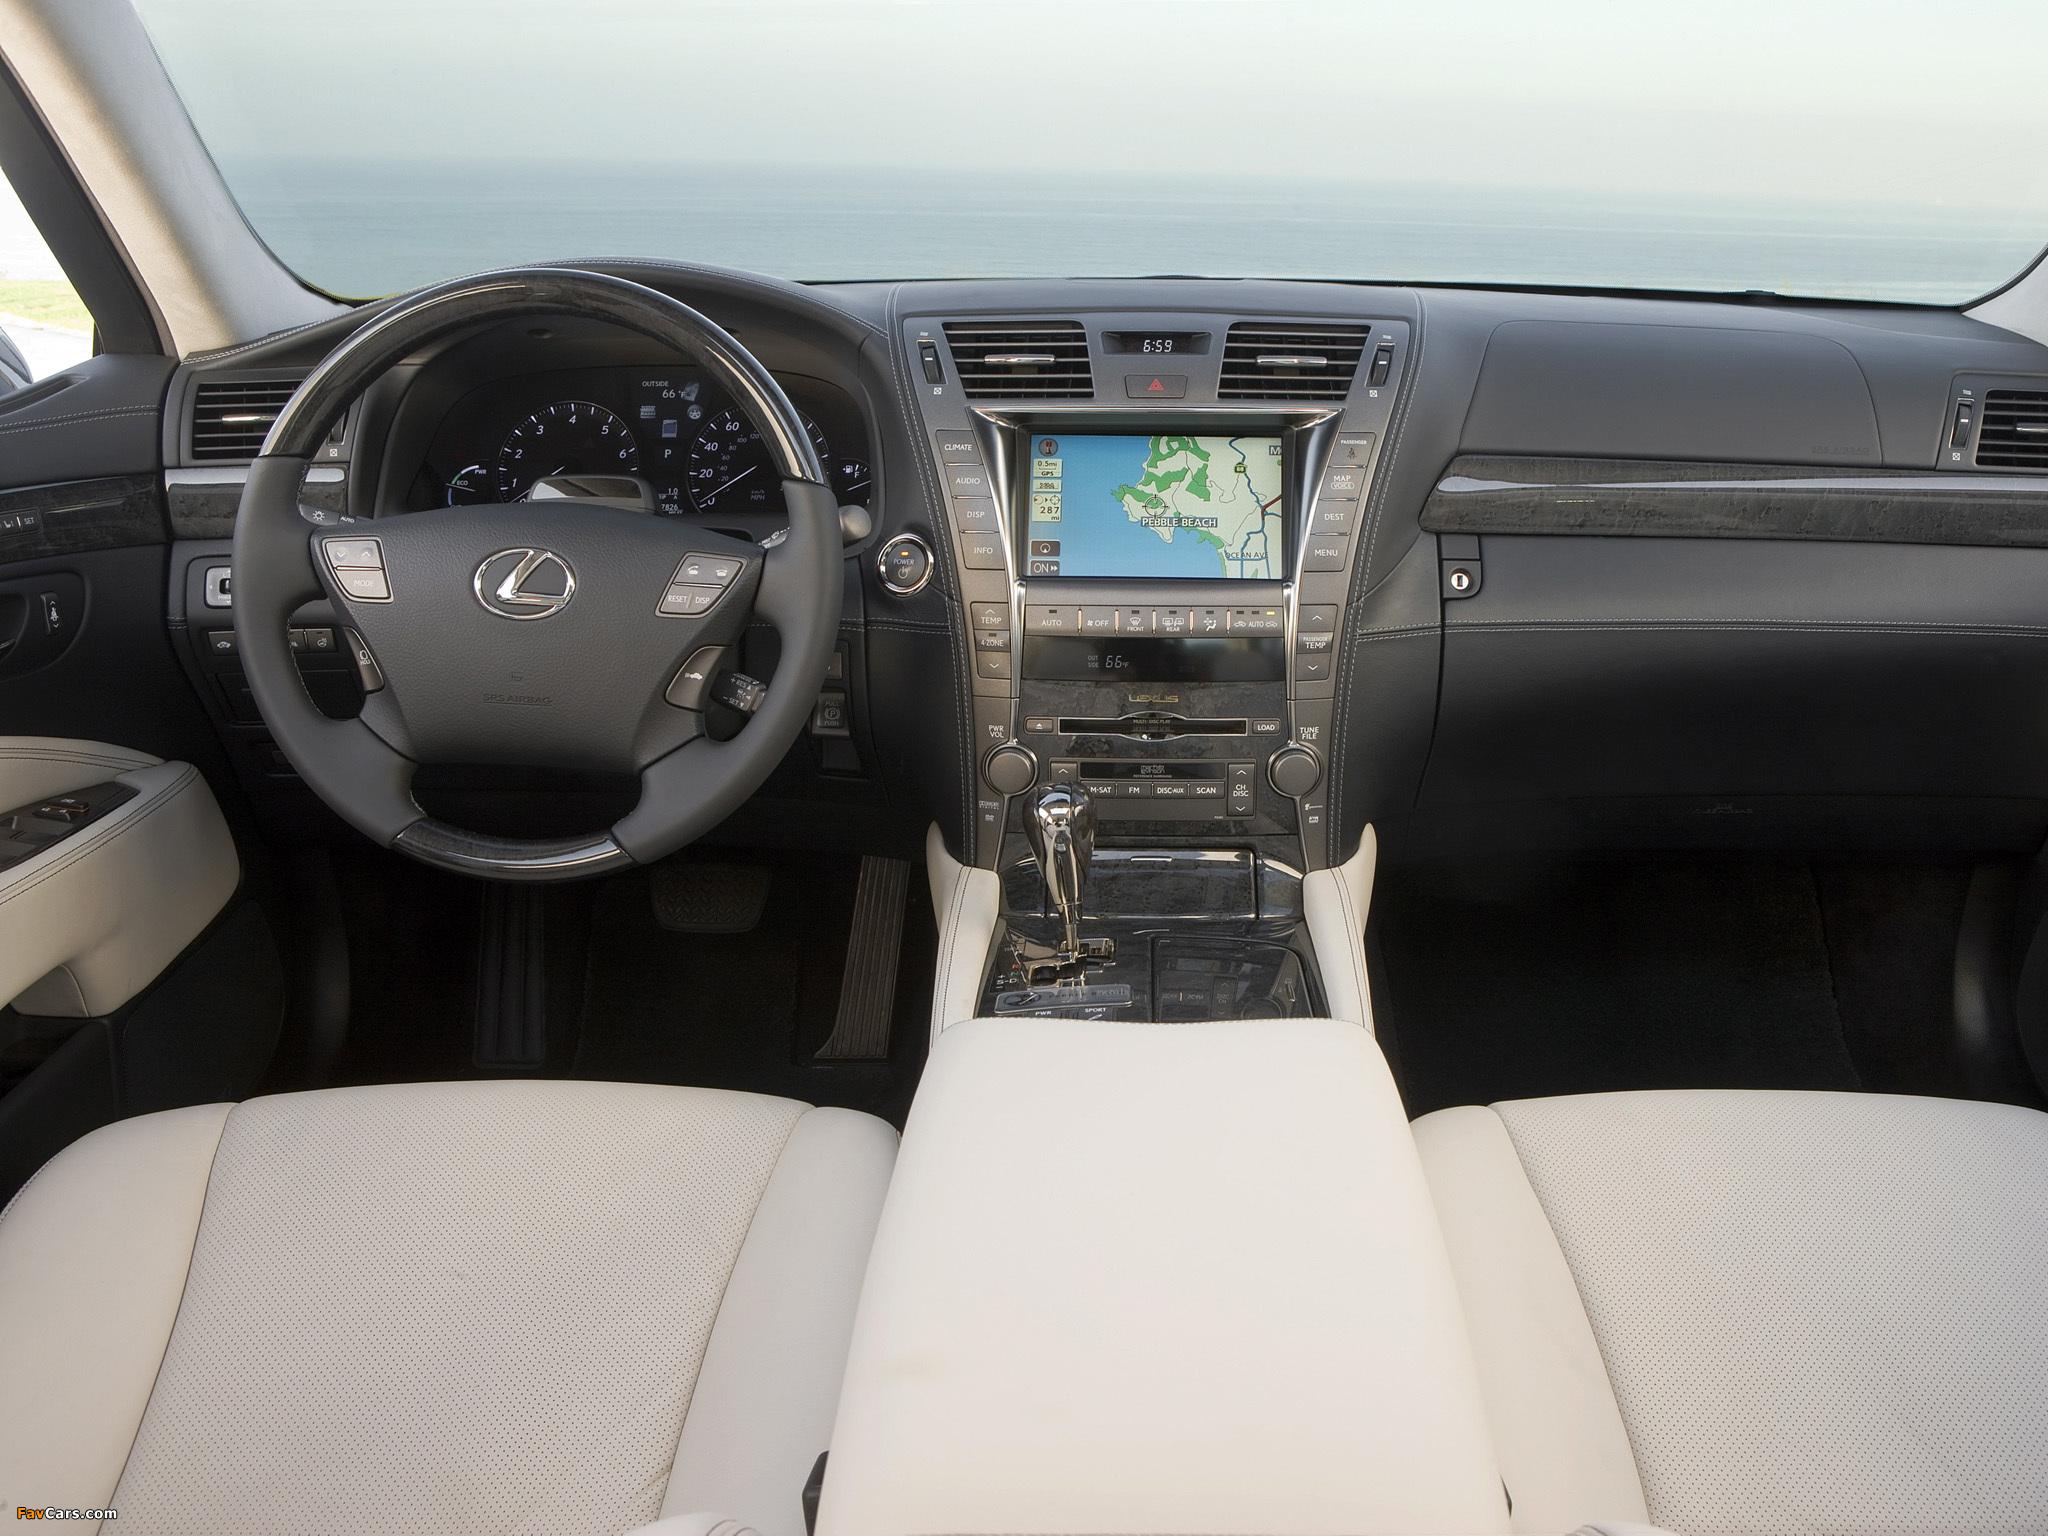 Lexus LS 600h L Pebble Beach Edition (UVF45) 2008 pictures (2048 x 1536)